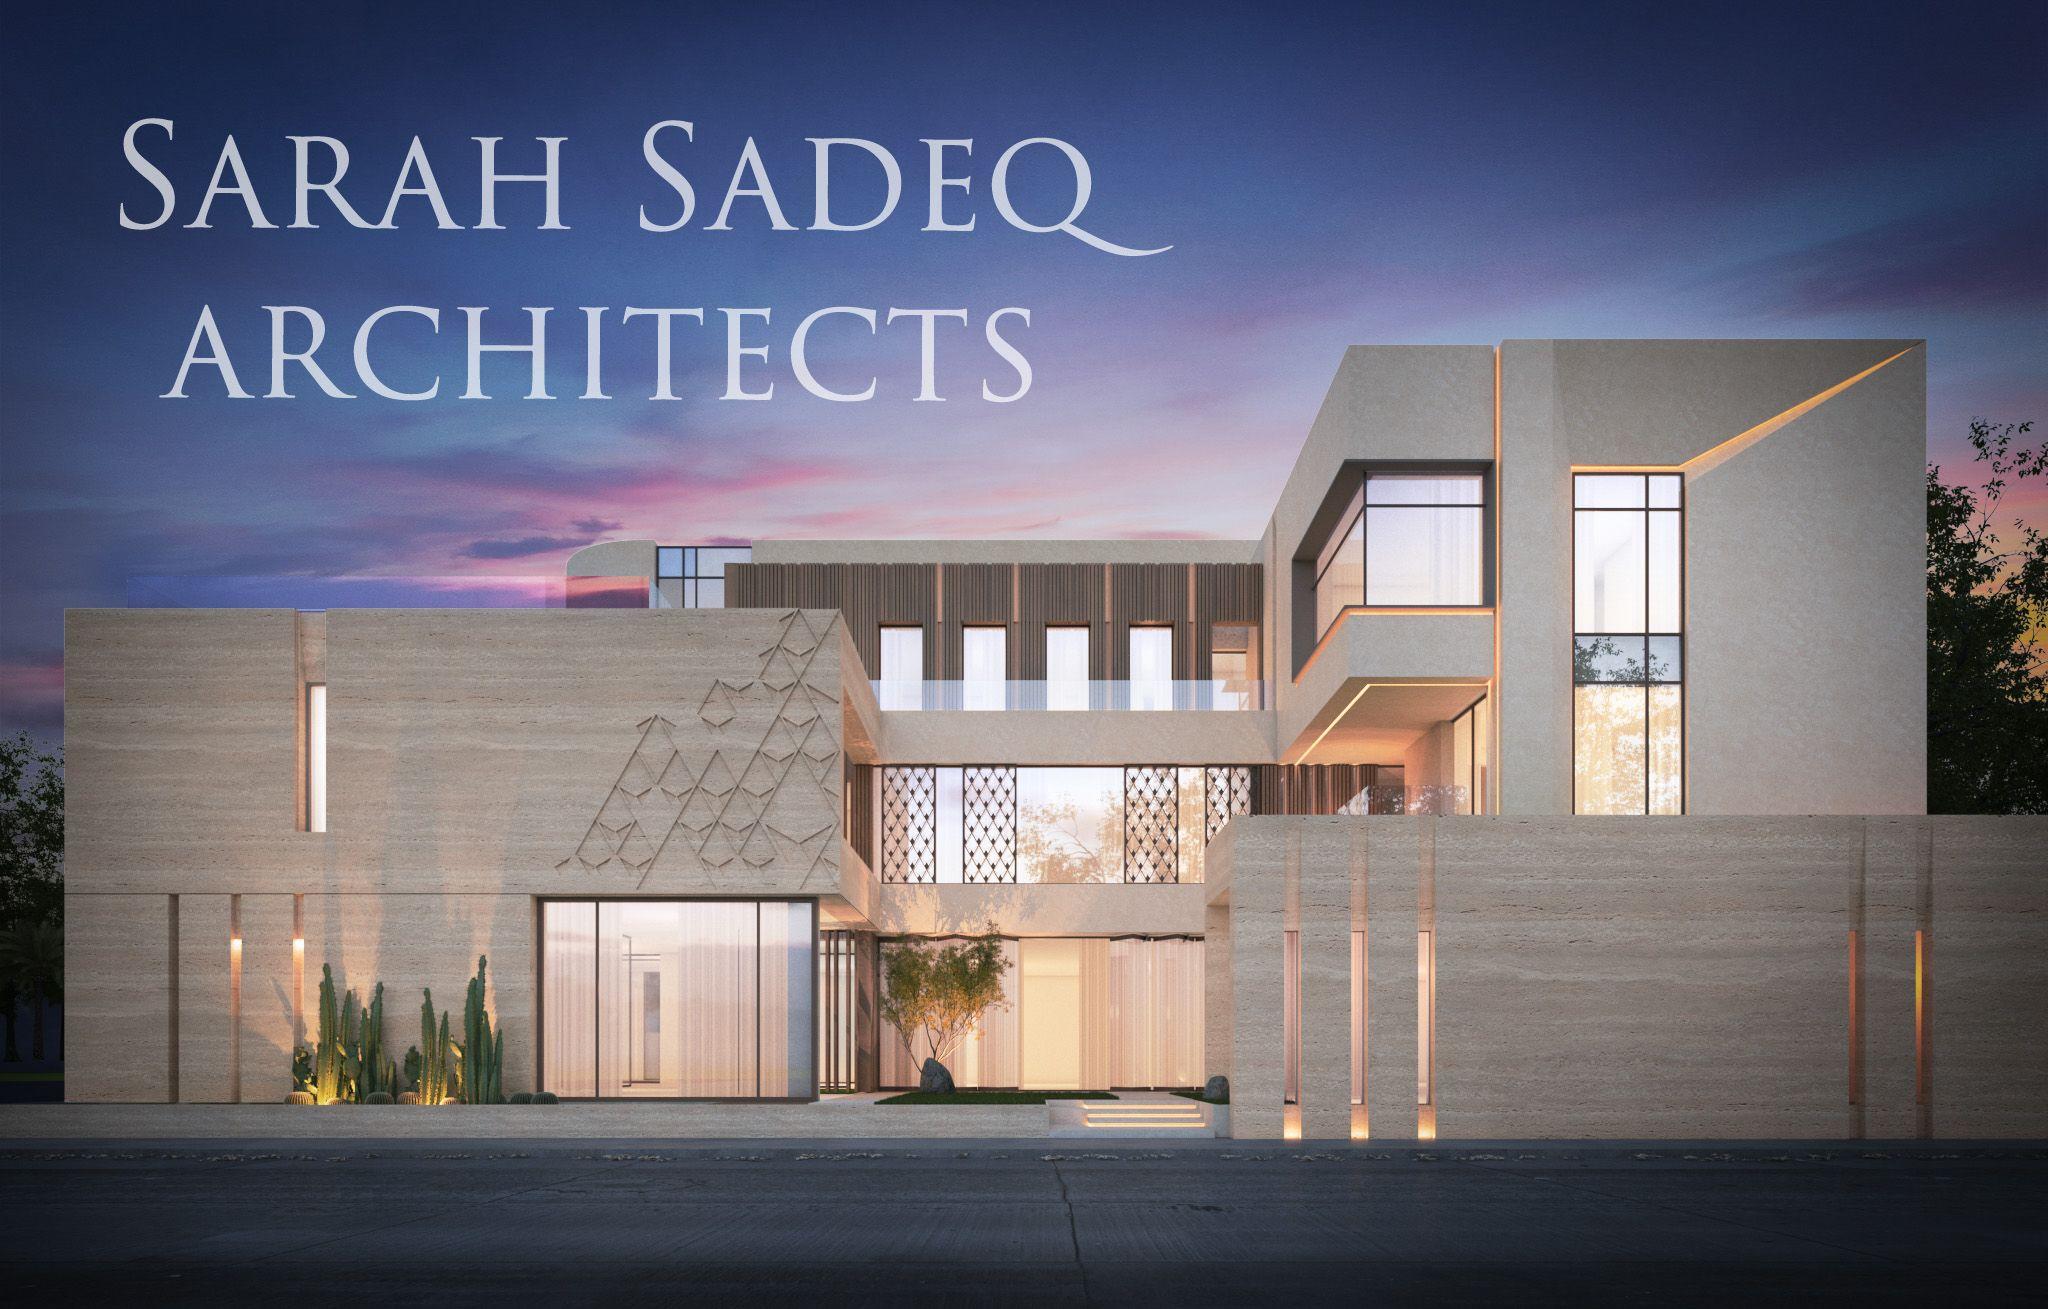 Sarah Sadeq Architects Letschat Sarahsadeq Com Facade House House Front Design House Exterior